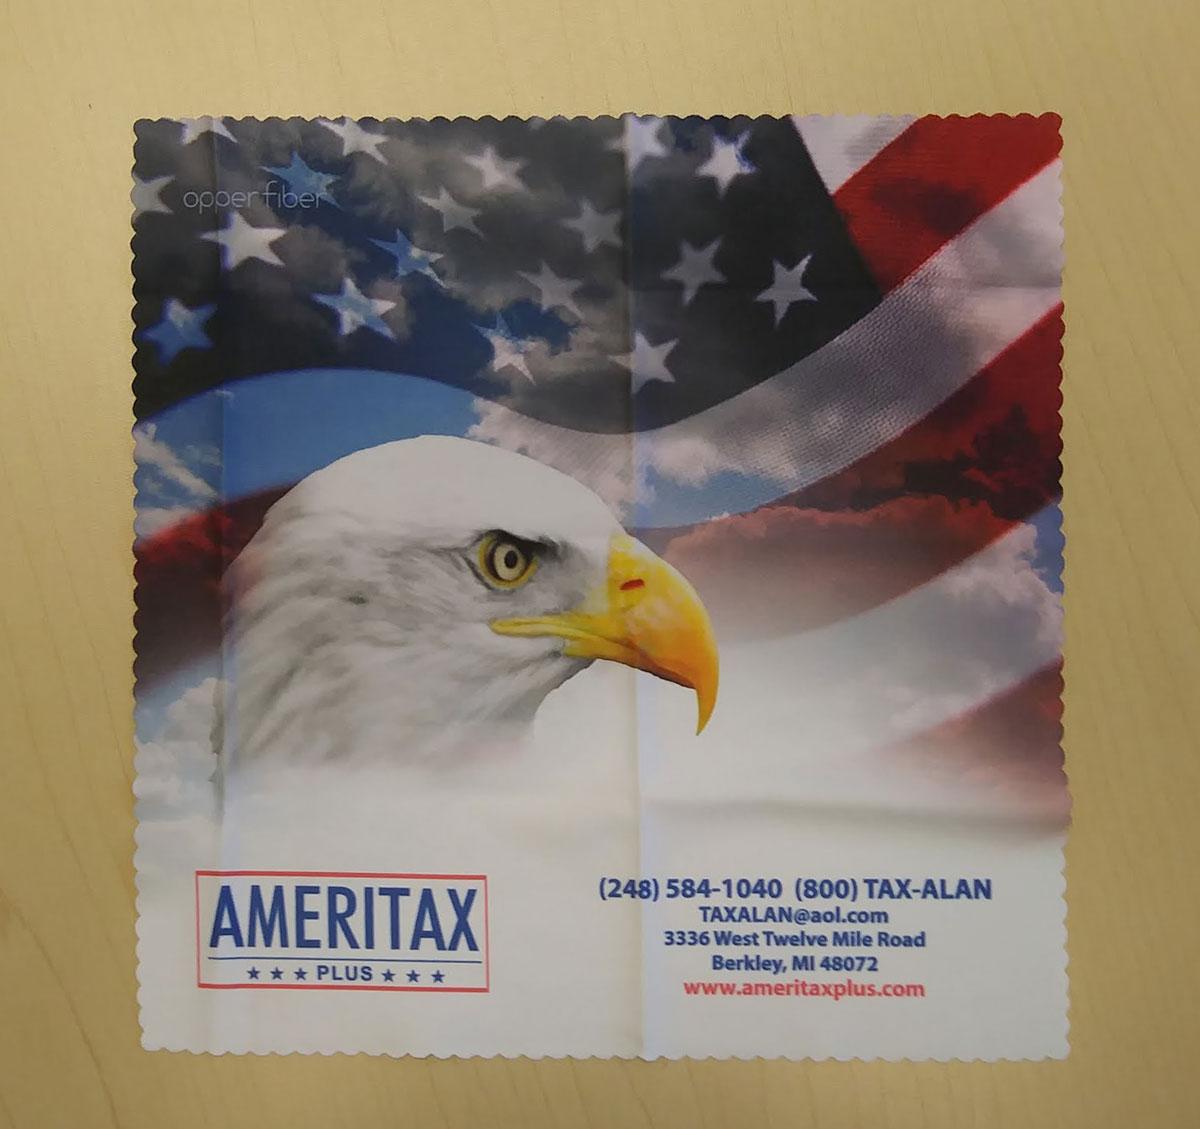 Ameritax Microfiber Cloth